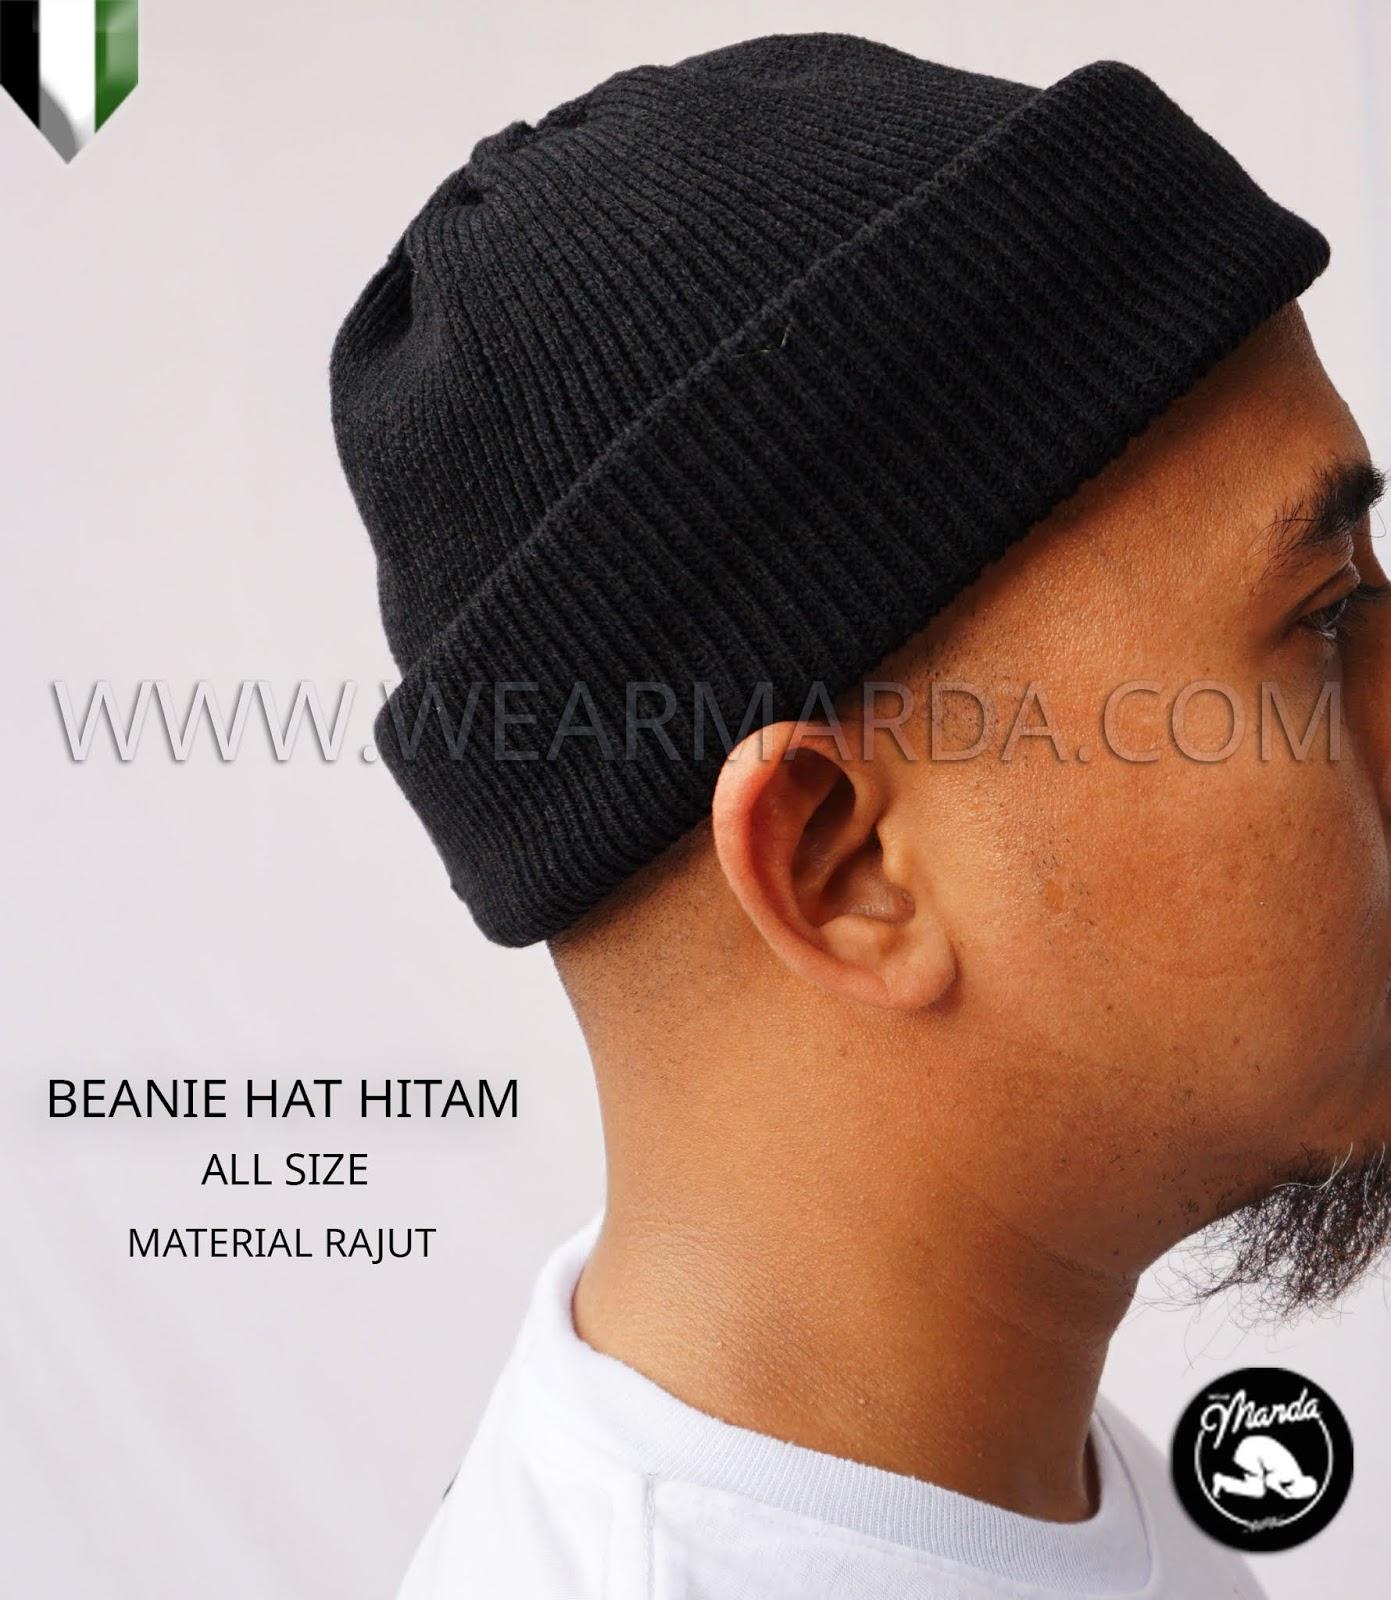 BEANIE HAT HITAM